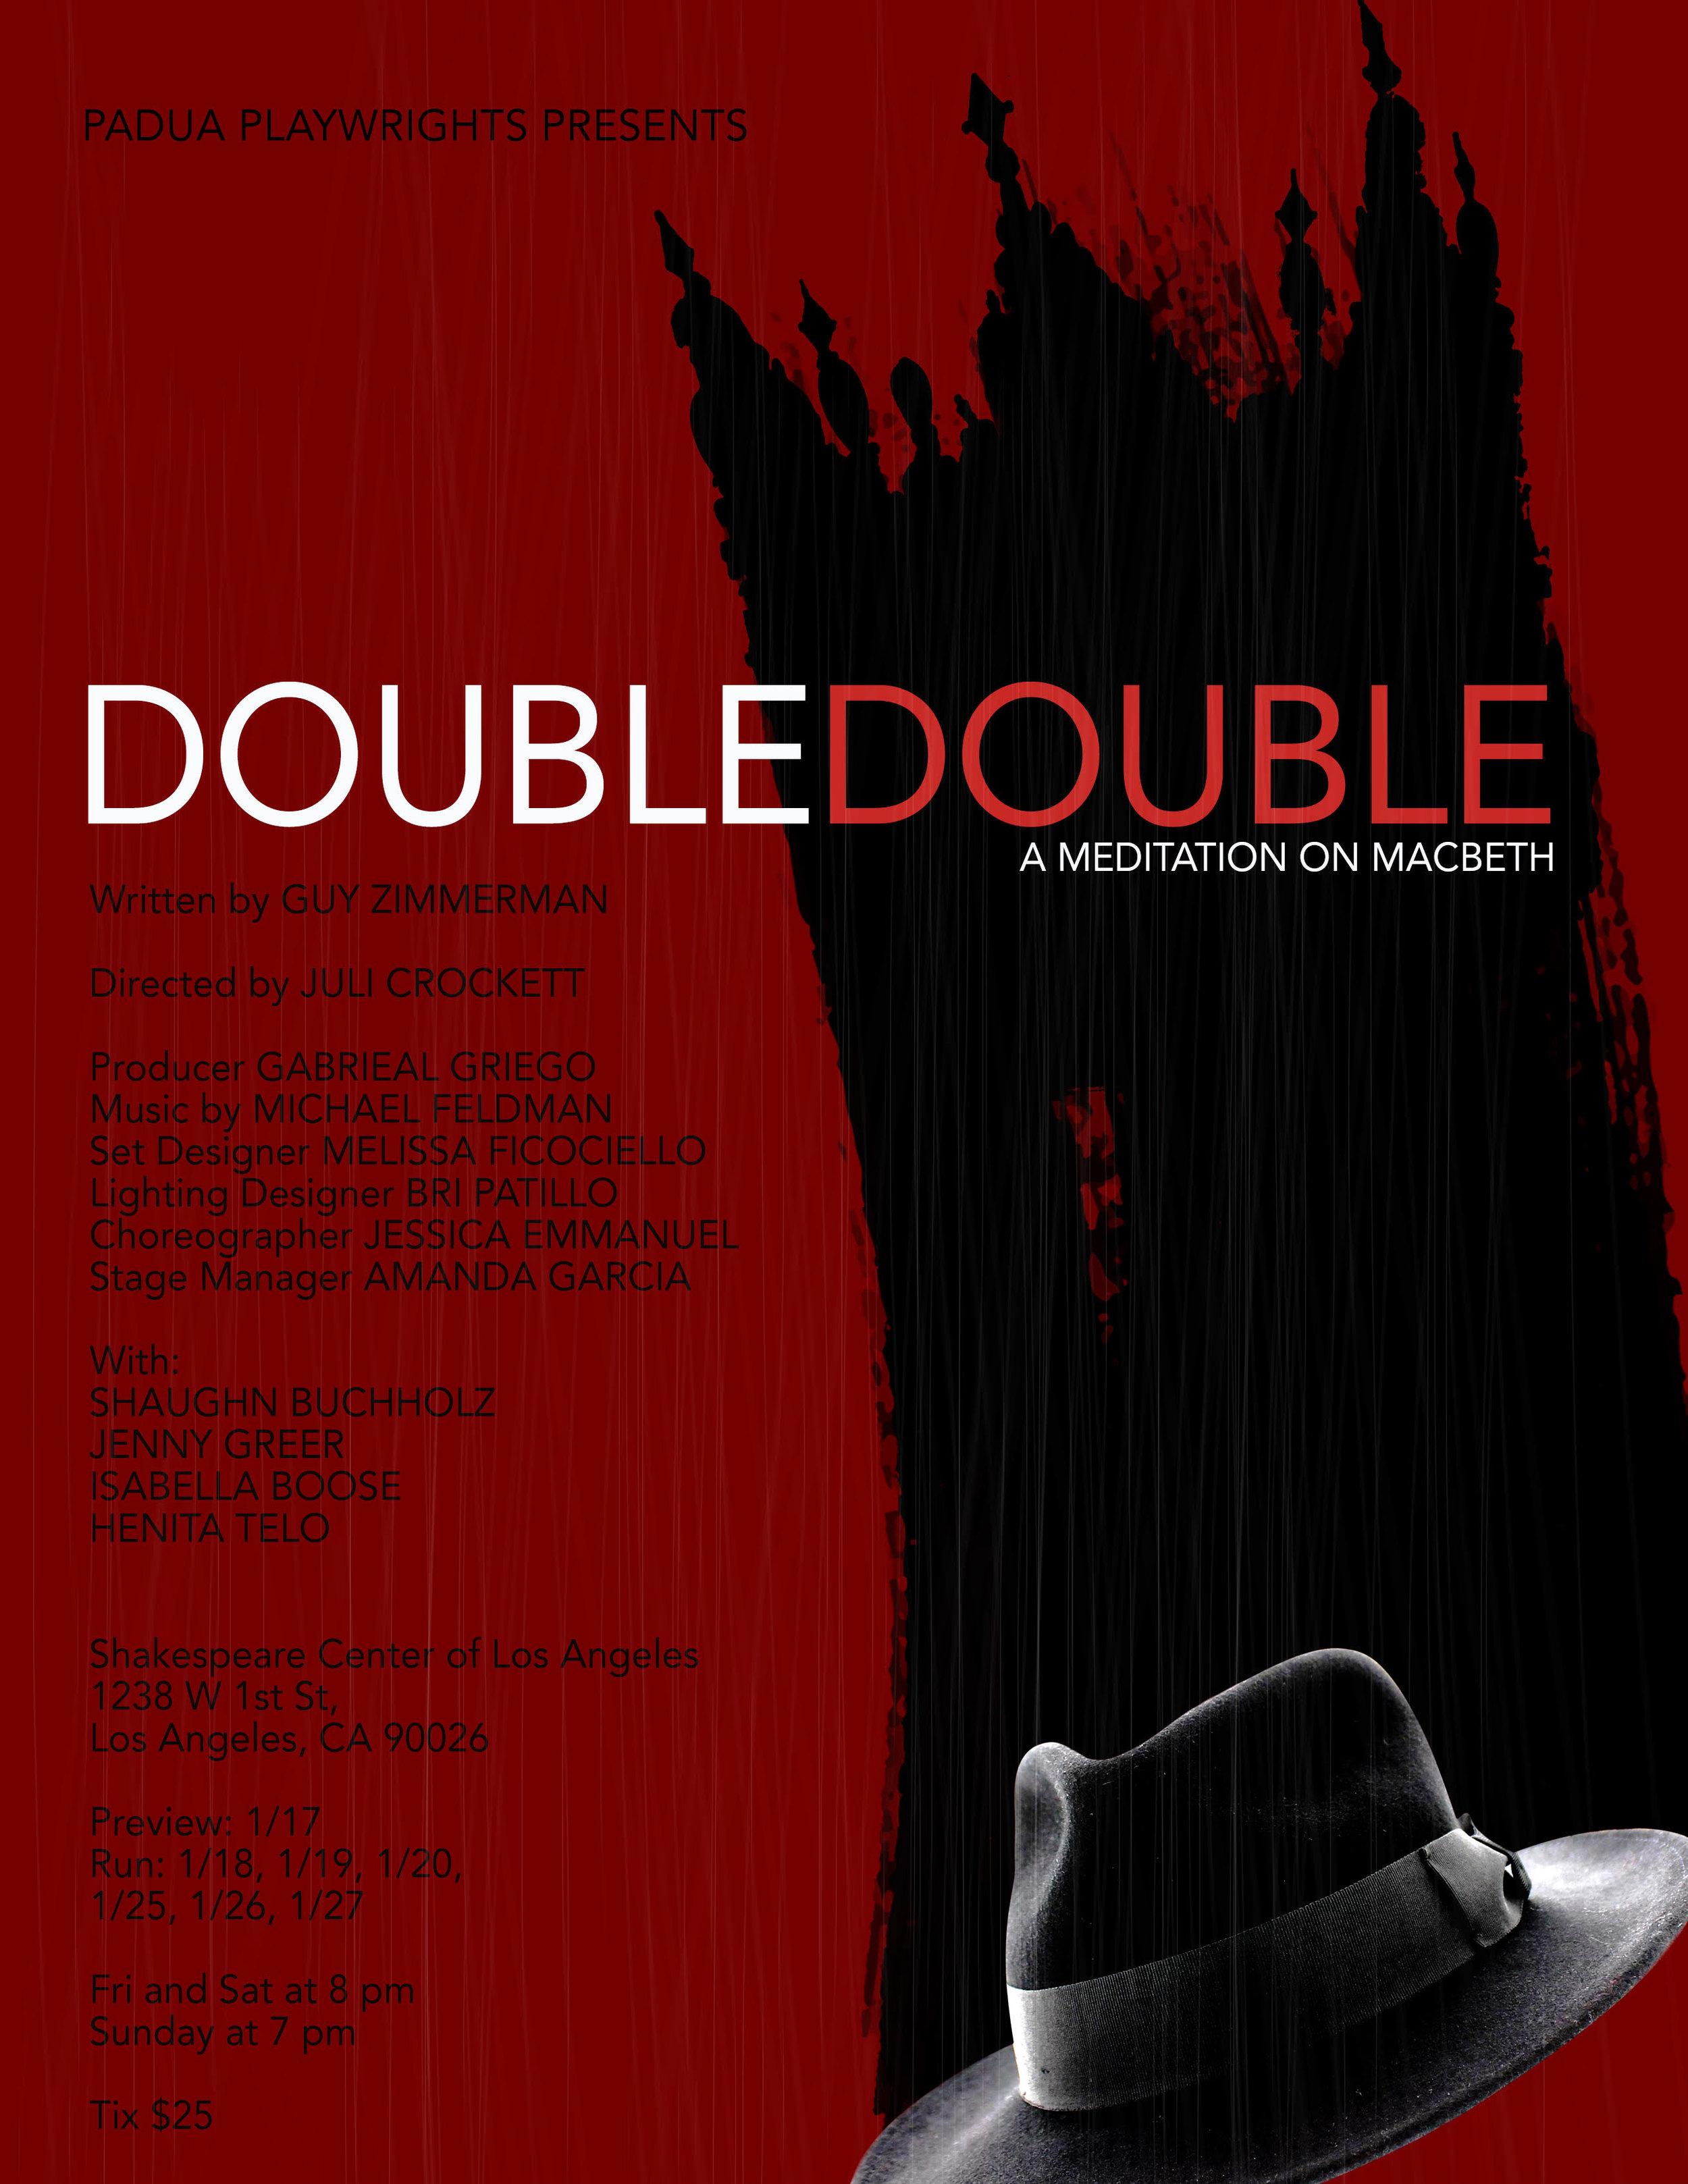 DoubleDouble2.jpg